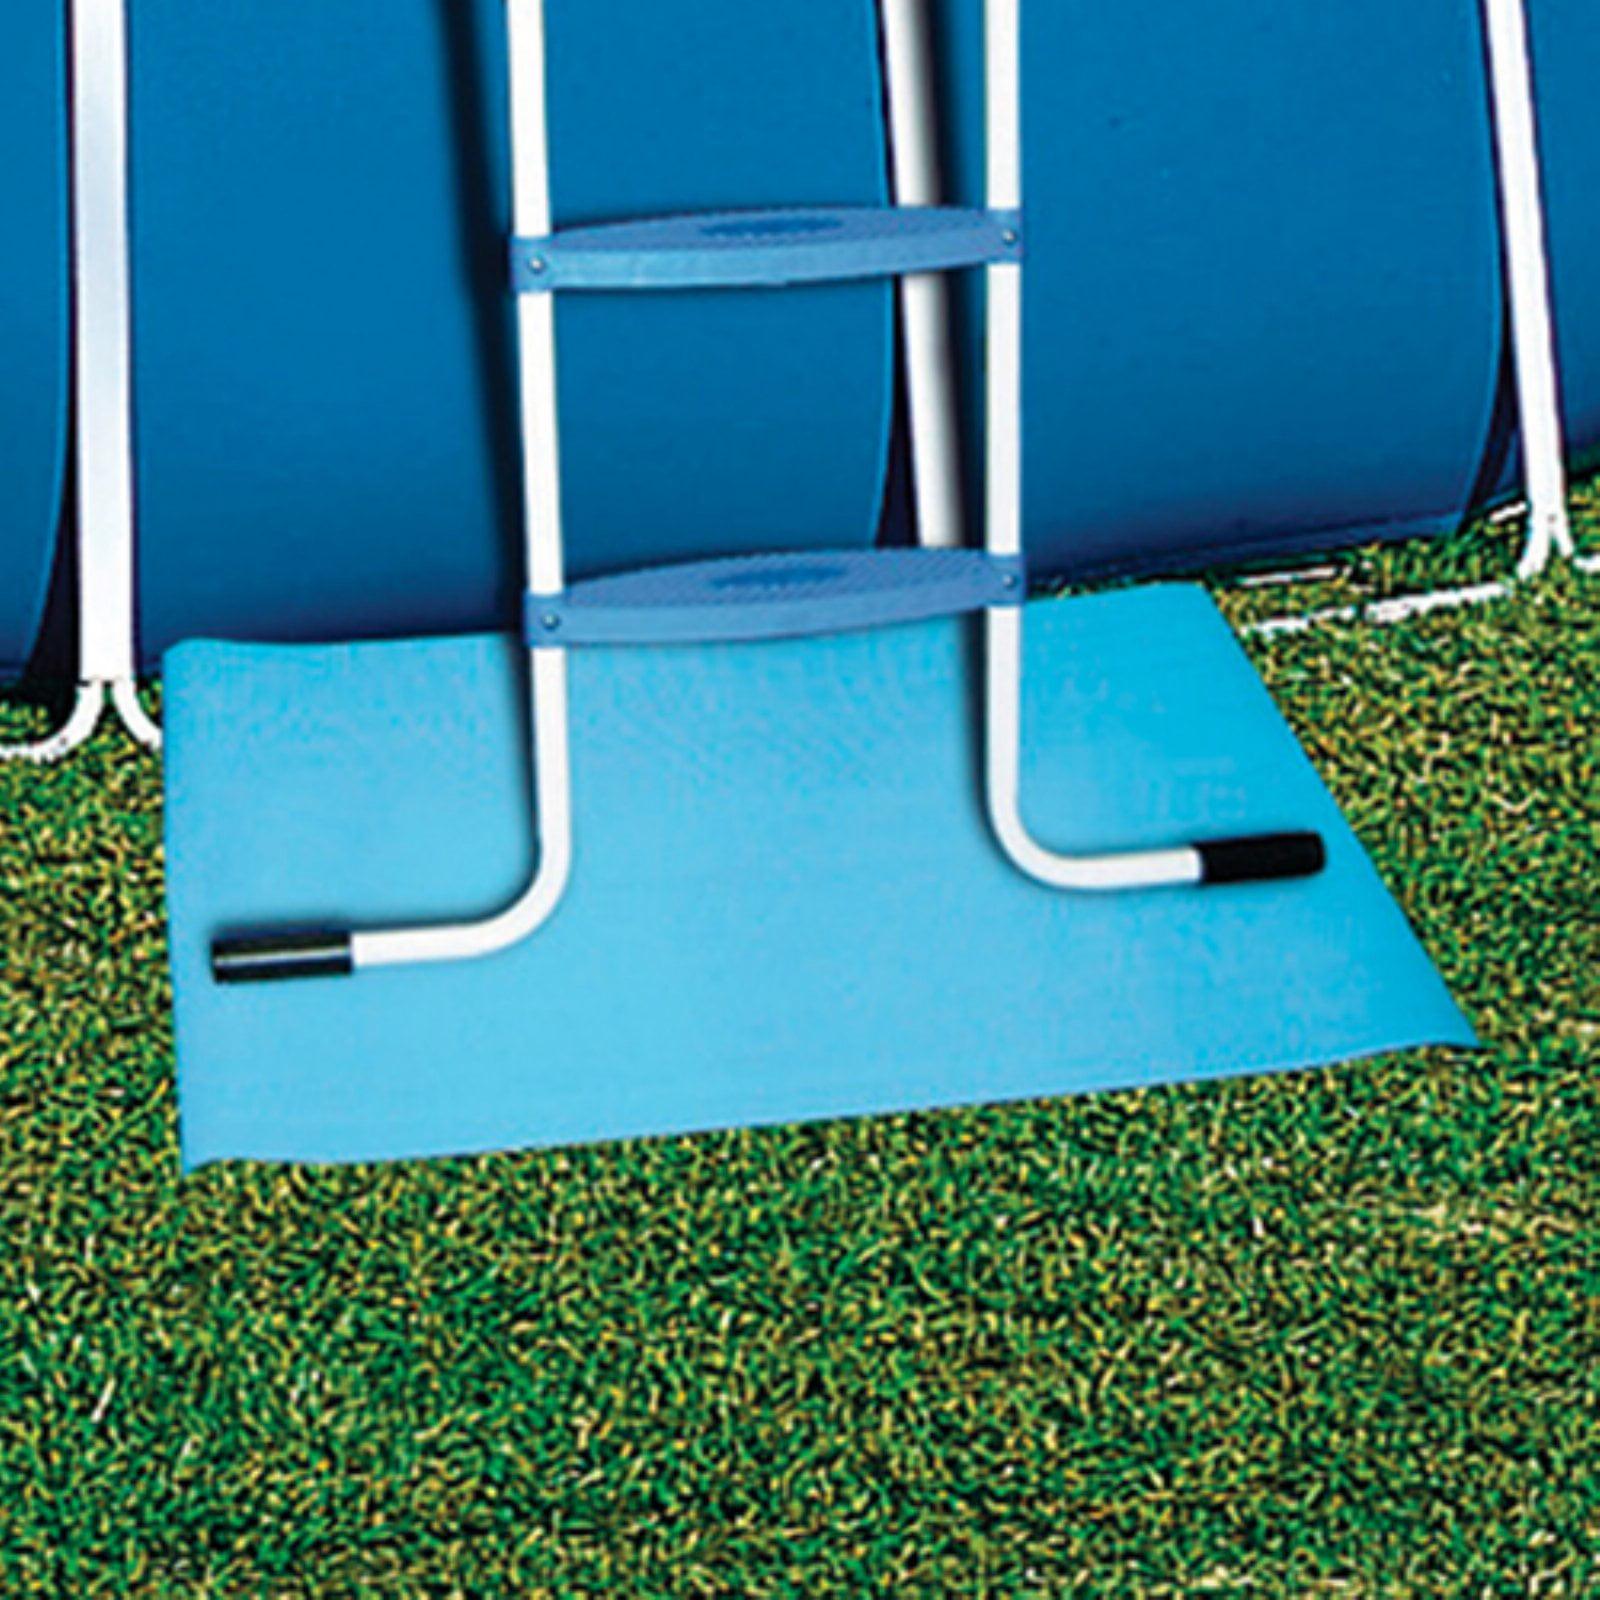 Poolmaster above ground swimming pool ladder pad 24 - Above ground swimming pool step pad ...